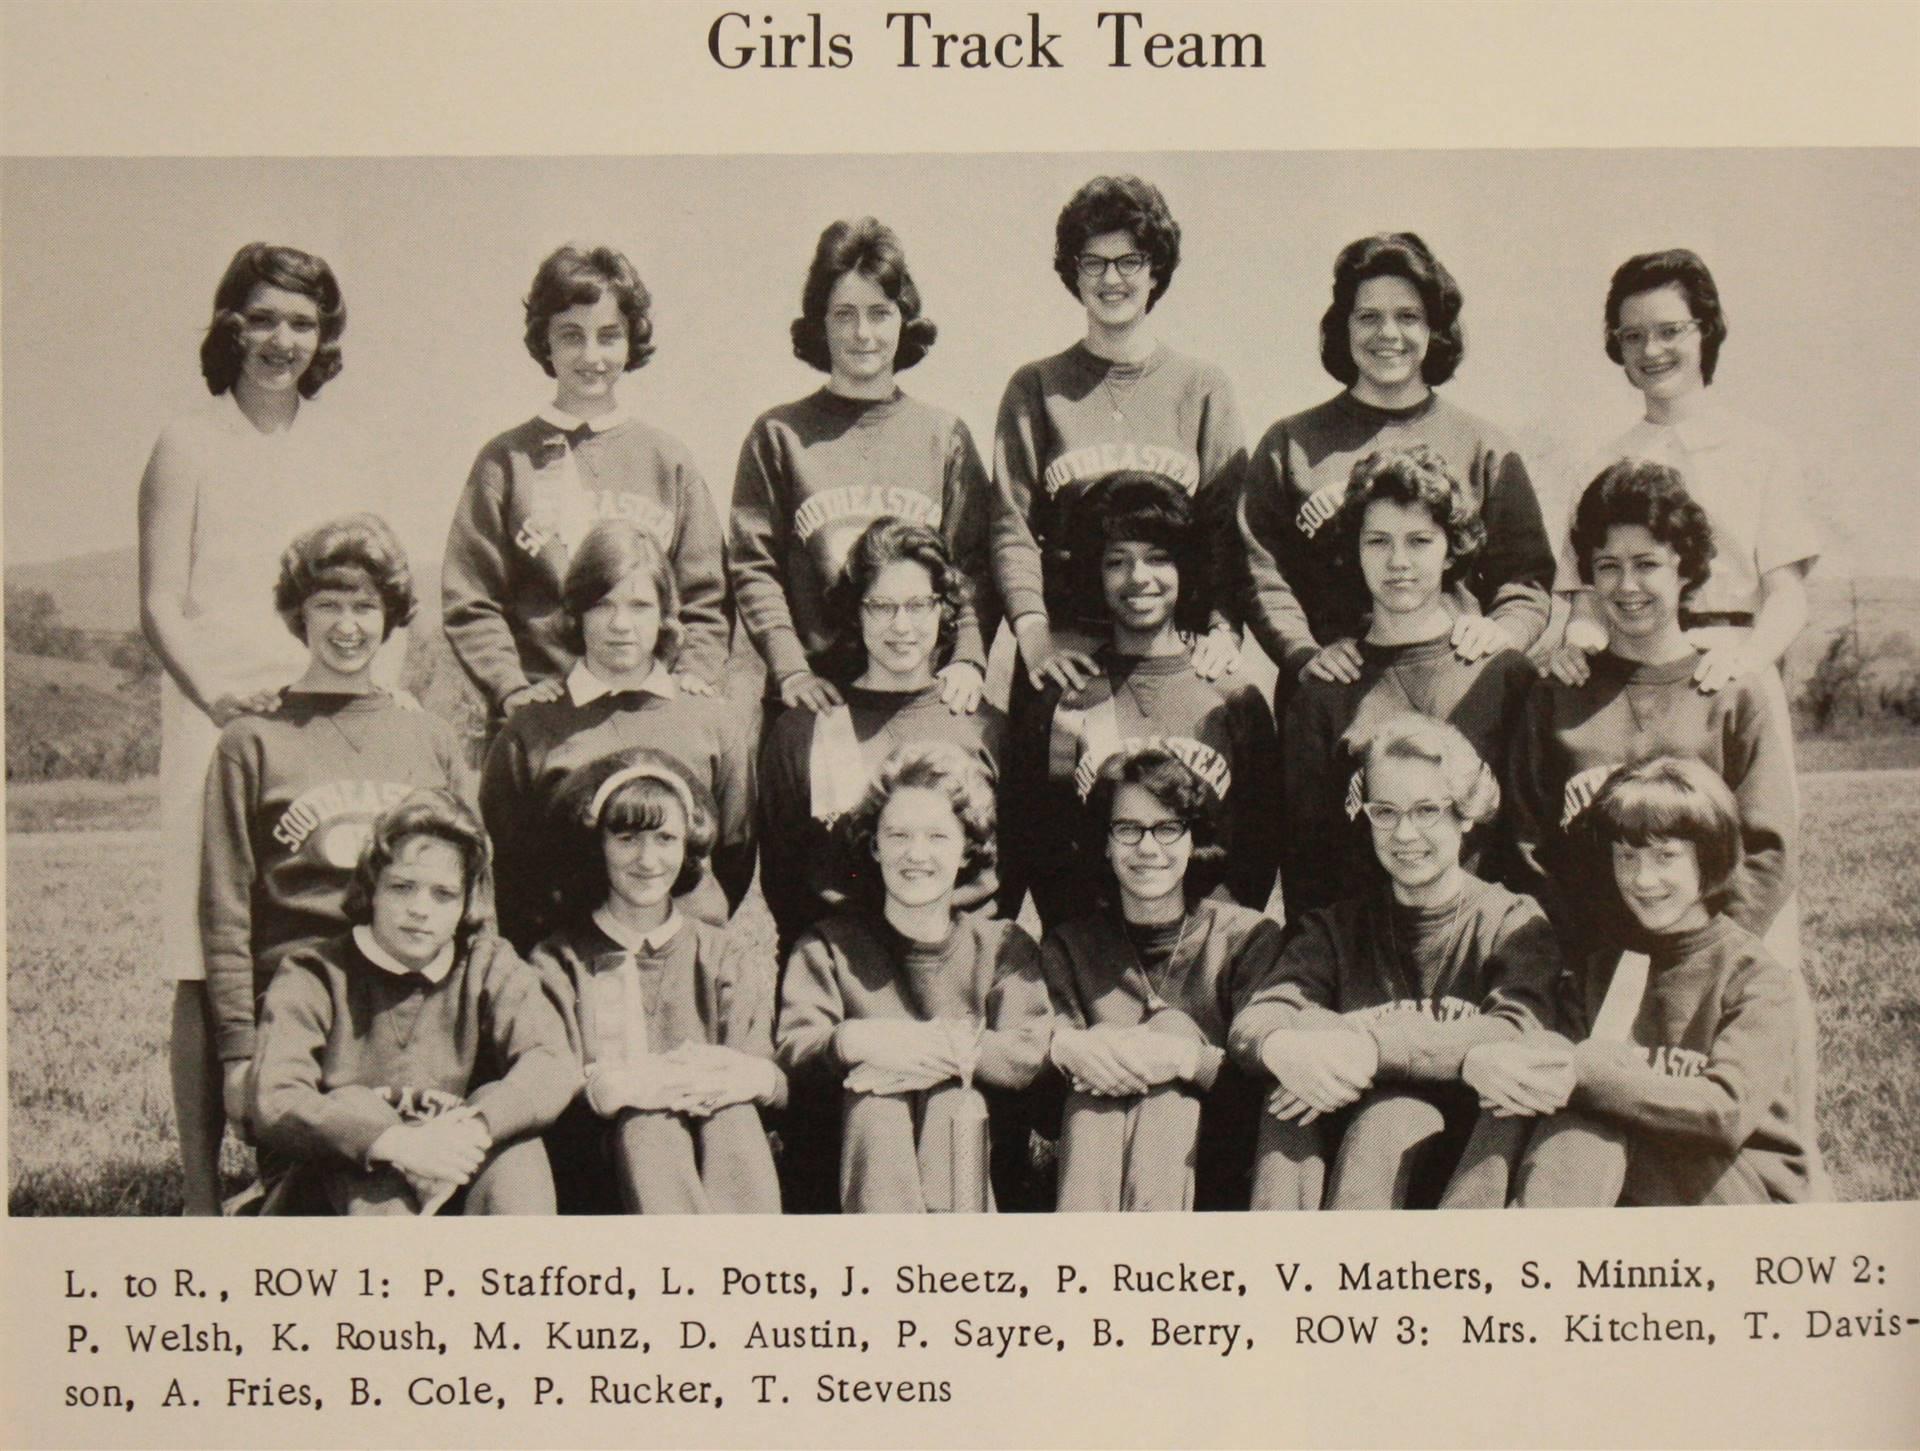 1965 girls track team